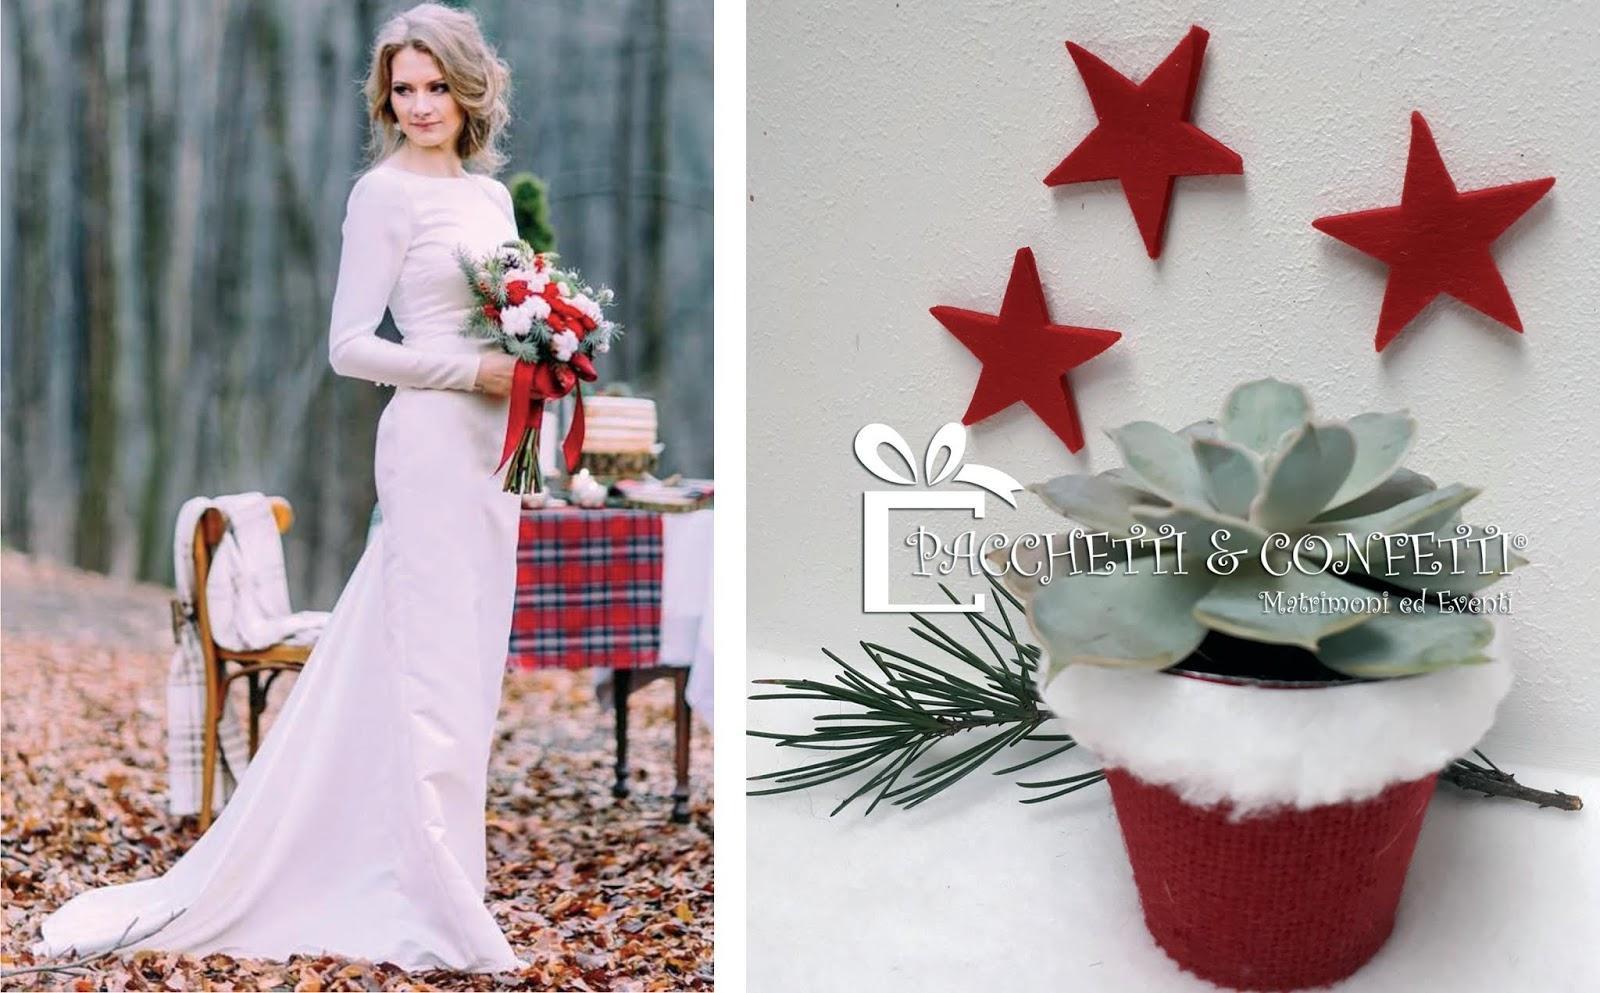 Bomboniere Natalizie Matrimonio.Pacchetti E Confetti Matrimonio A Natale Bomboniere E Ispirazioni